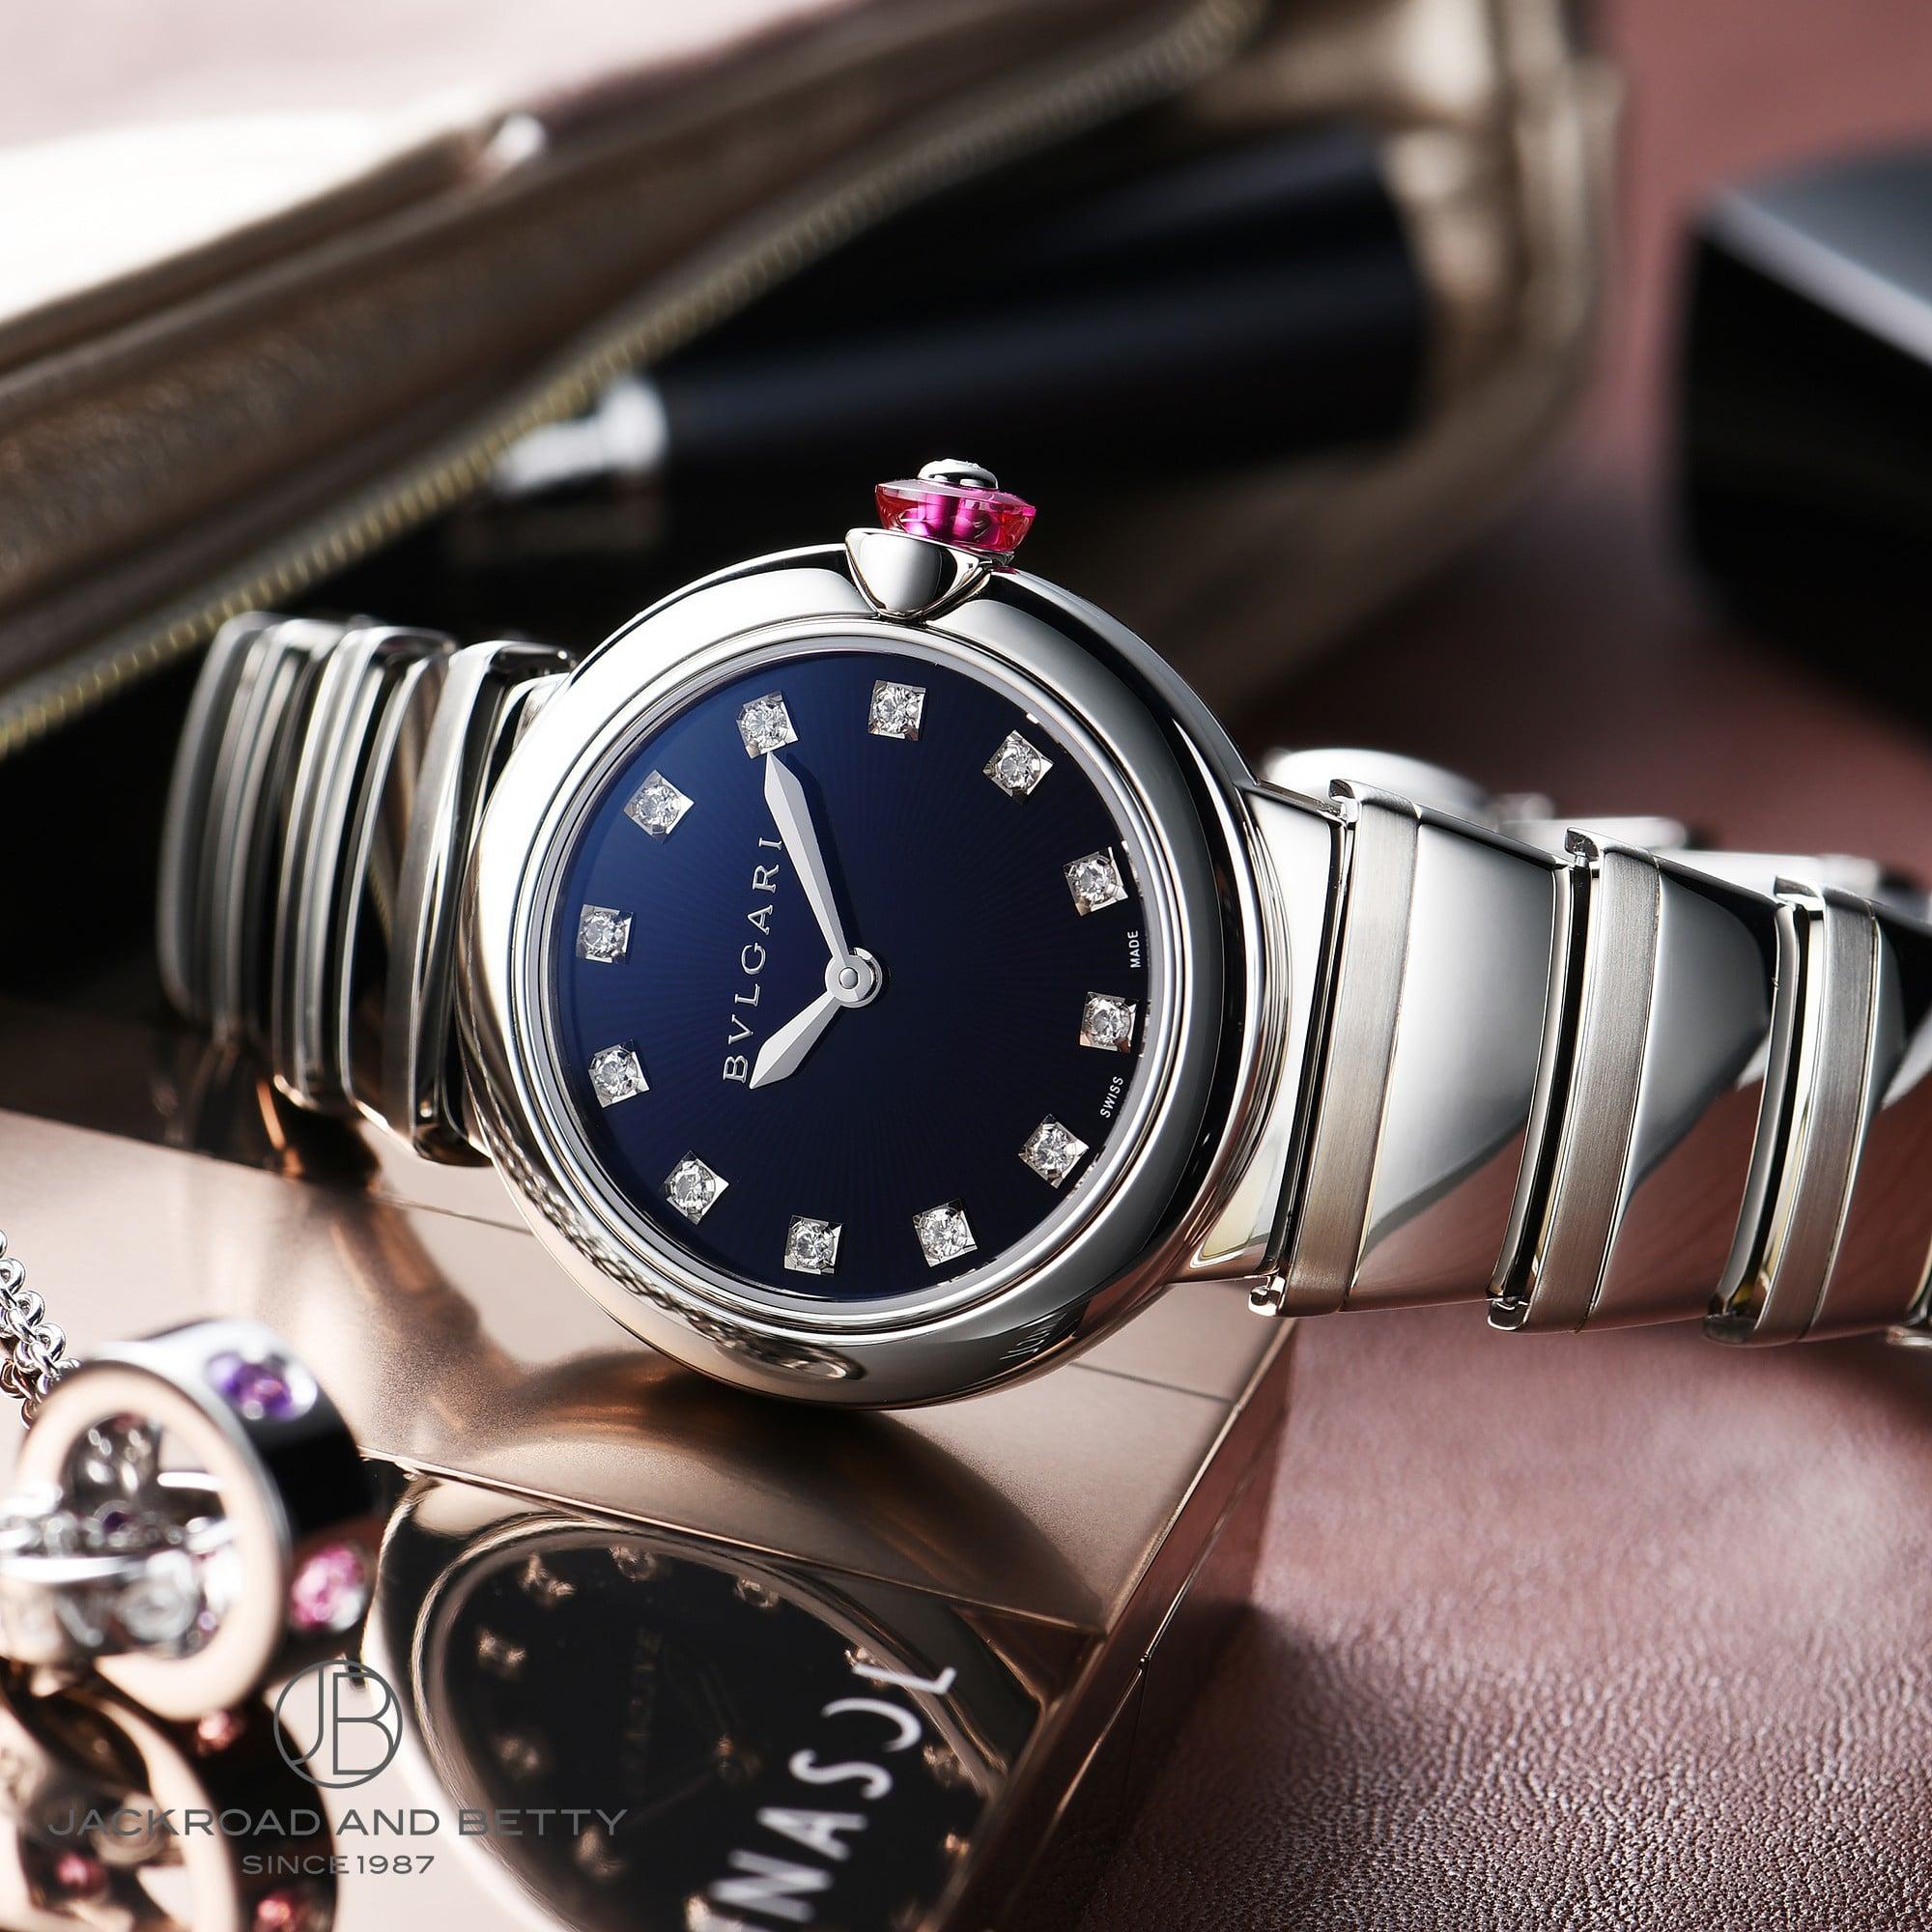 abed175fbf67 ブルガリ BVLGARI ルチェア LU28C3SS/12 【新品】 時計 レディース:ベティーロード 【腕時計専門店】 - 56dee -  anmima.sk